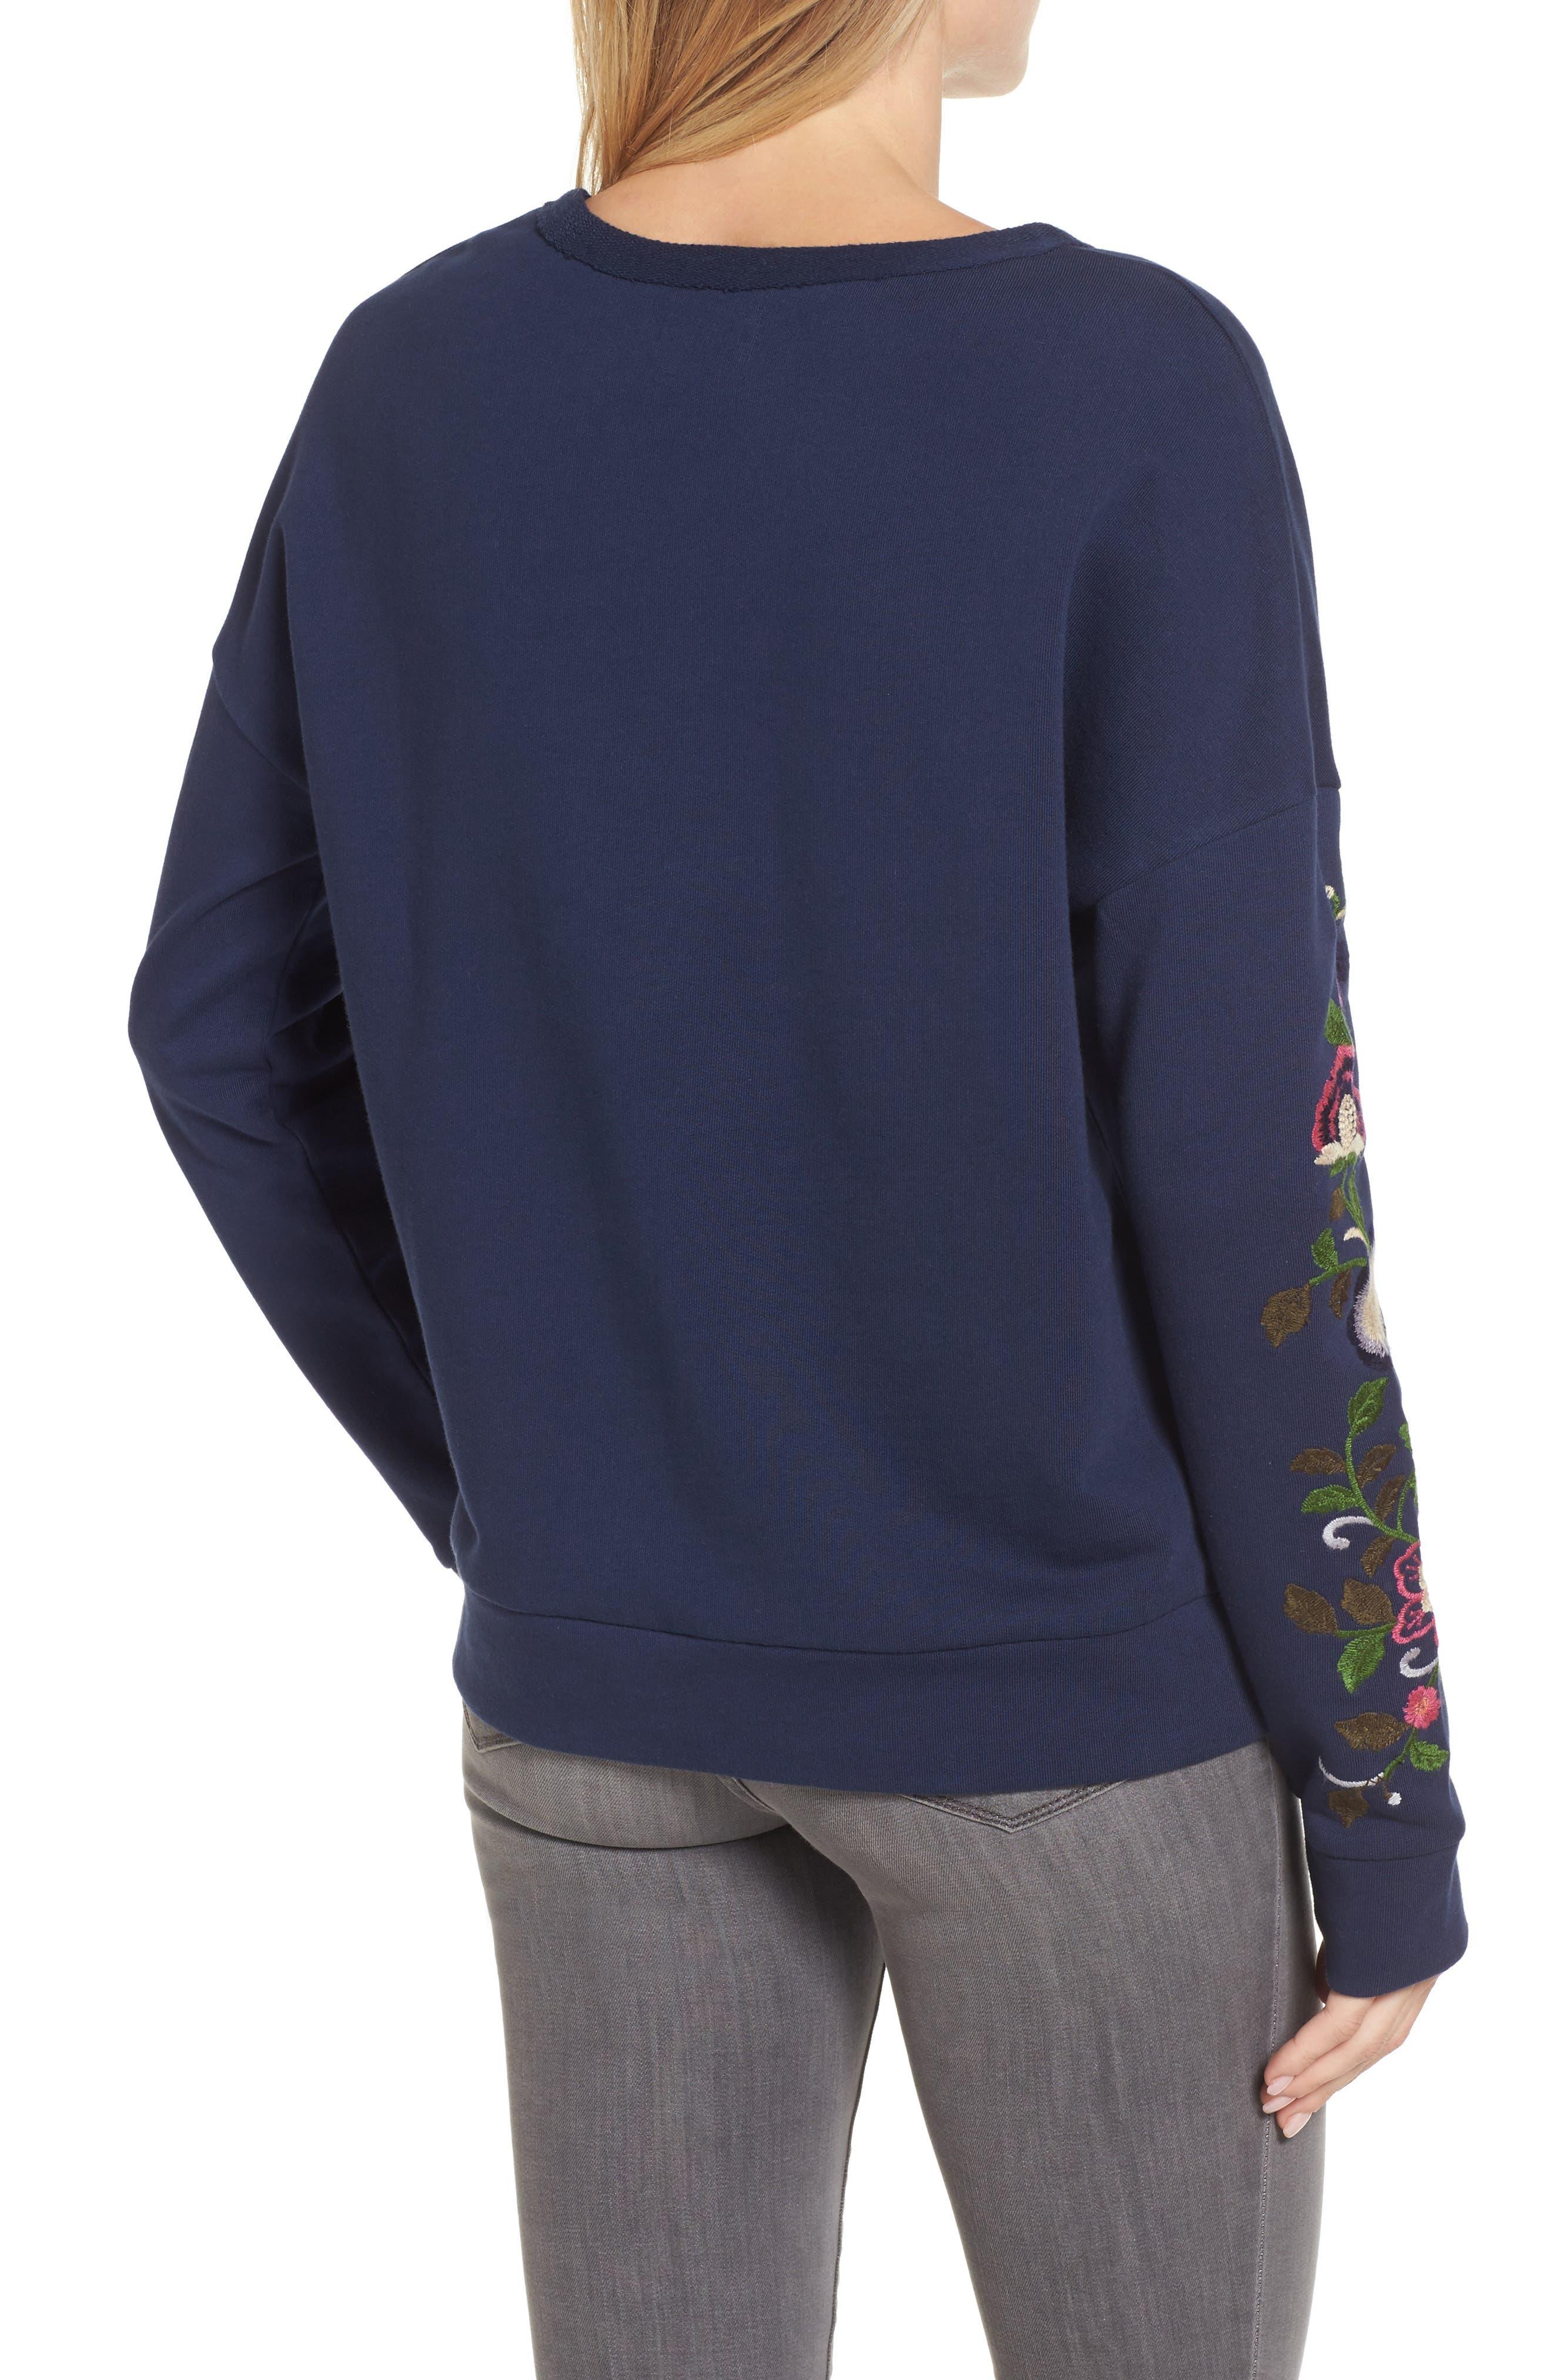 Embroidered Sleeve Sweatshirt,                             Alternate thumbnail 2, color,                             410